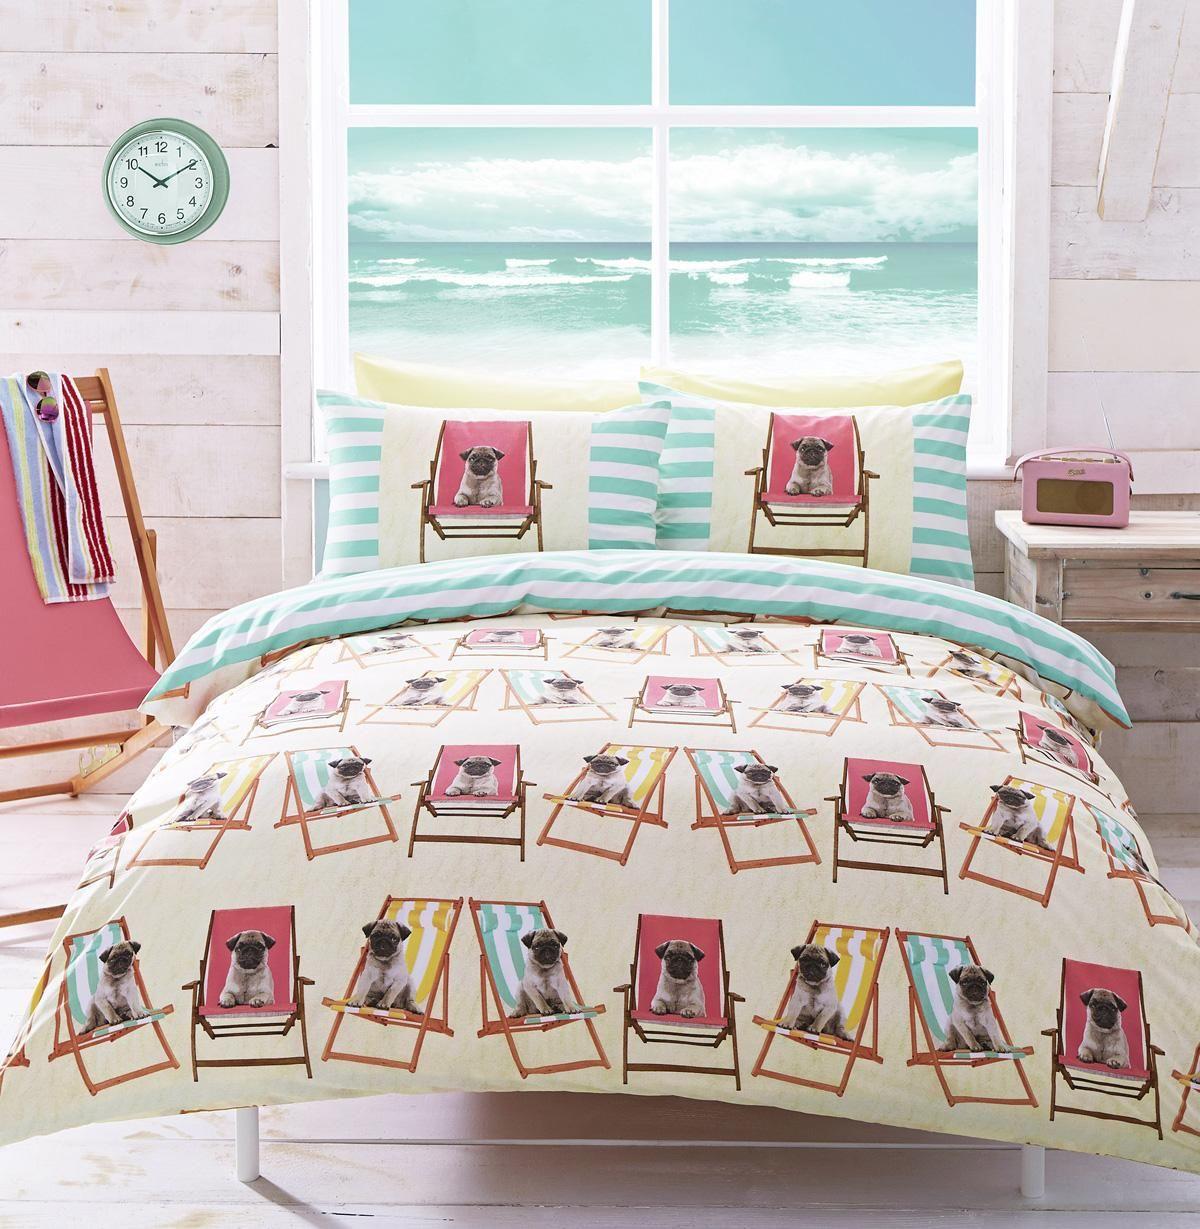 Bedding Pug Bedding in Multicolour Duvet cover sets